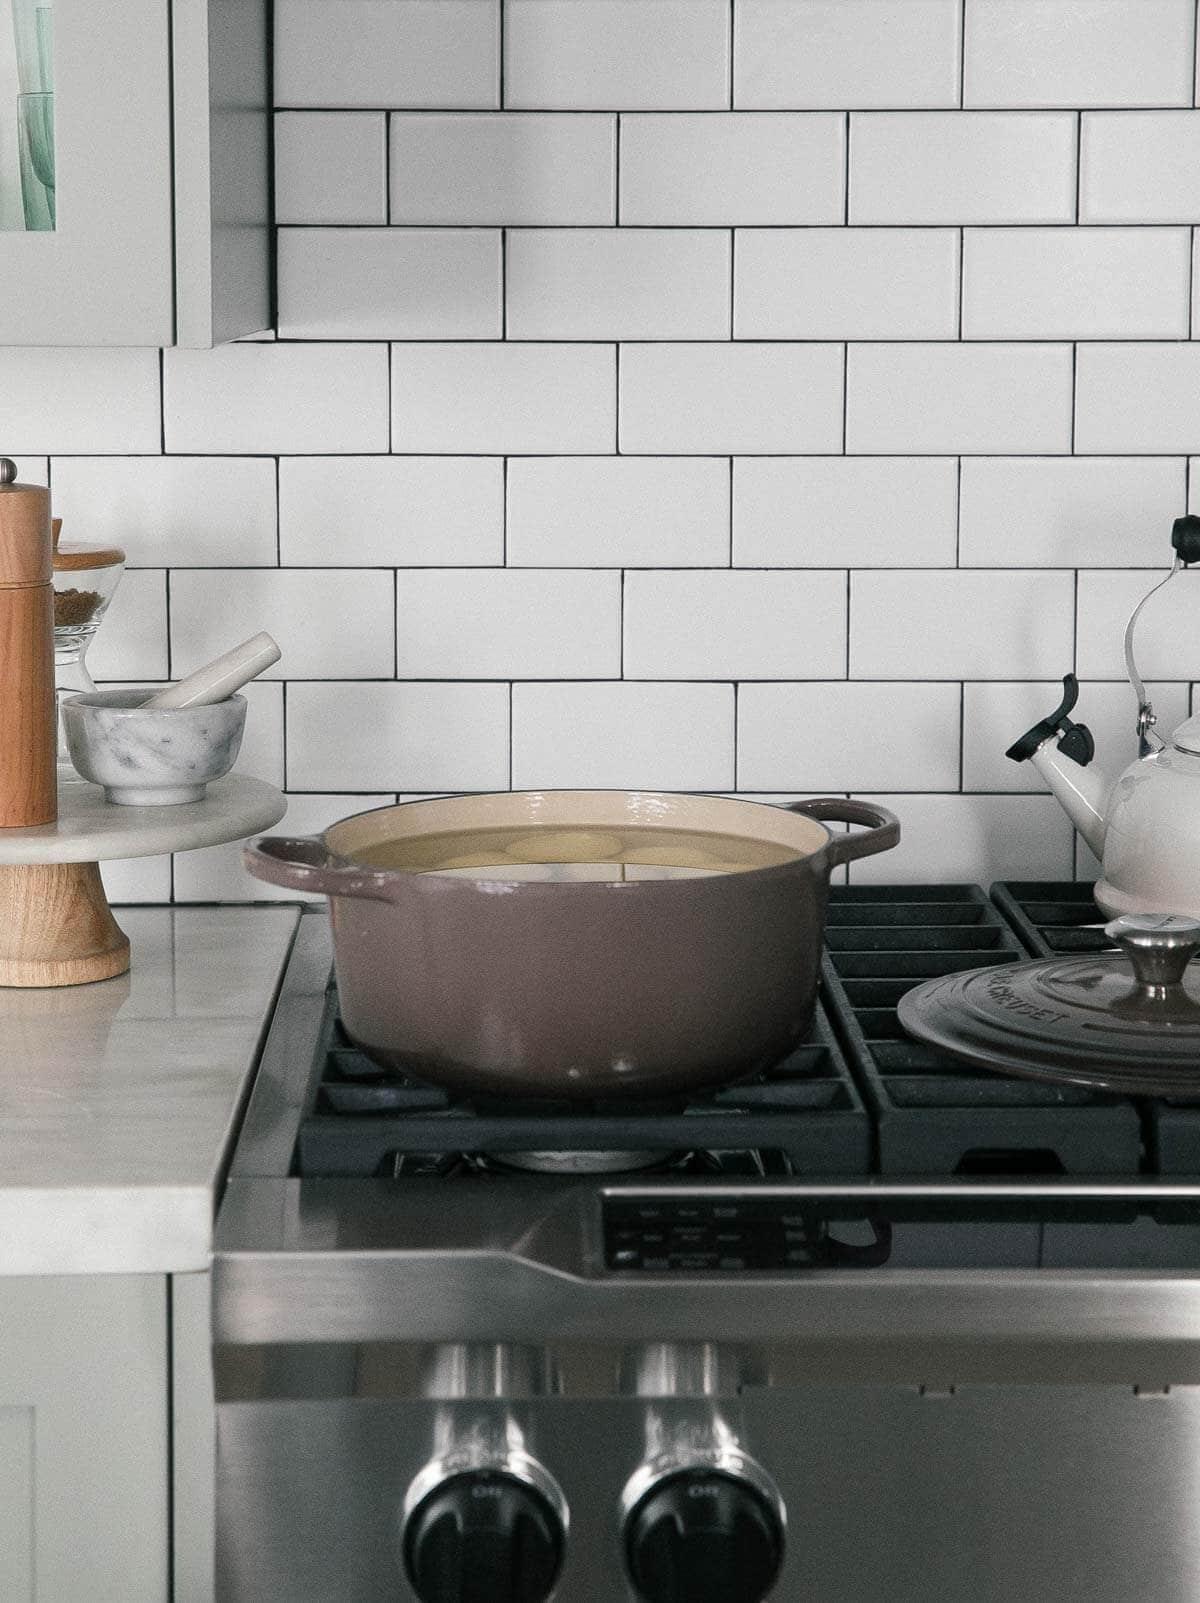 Cacio E Pepe Mashed Potatoes Recipe A Cozy Kitchen